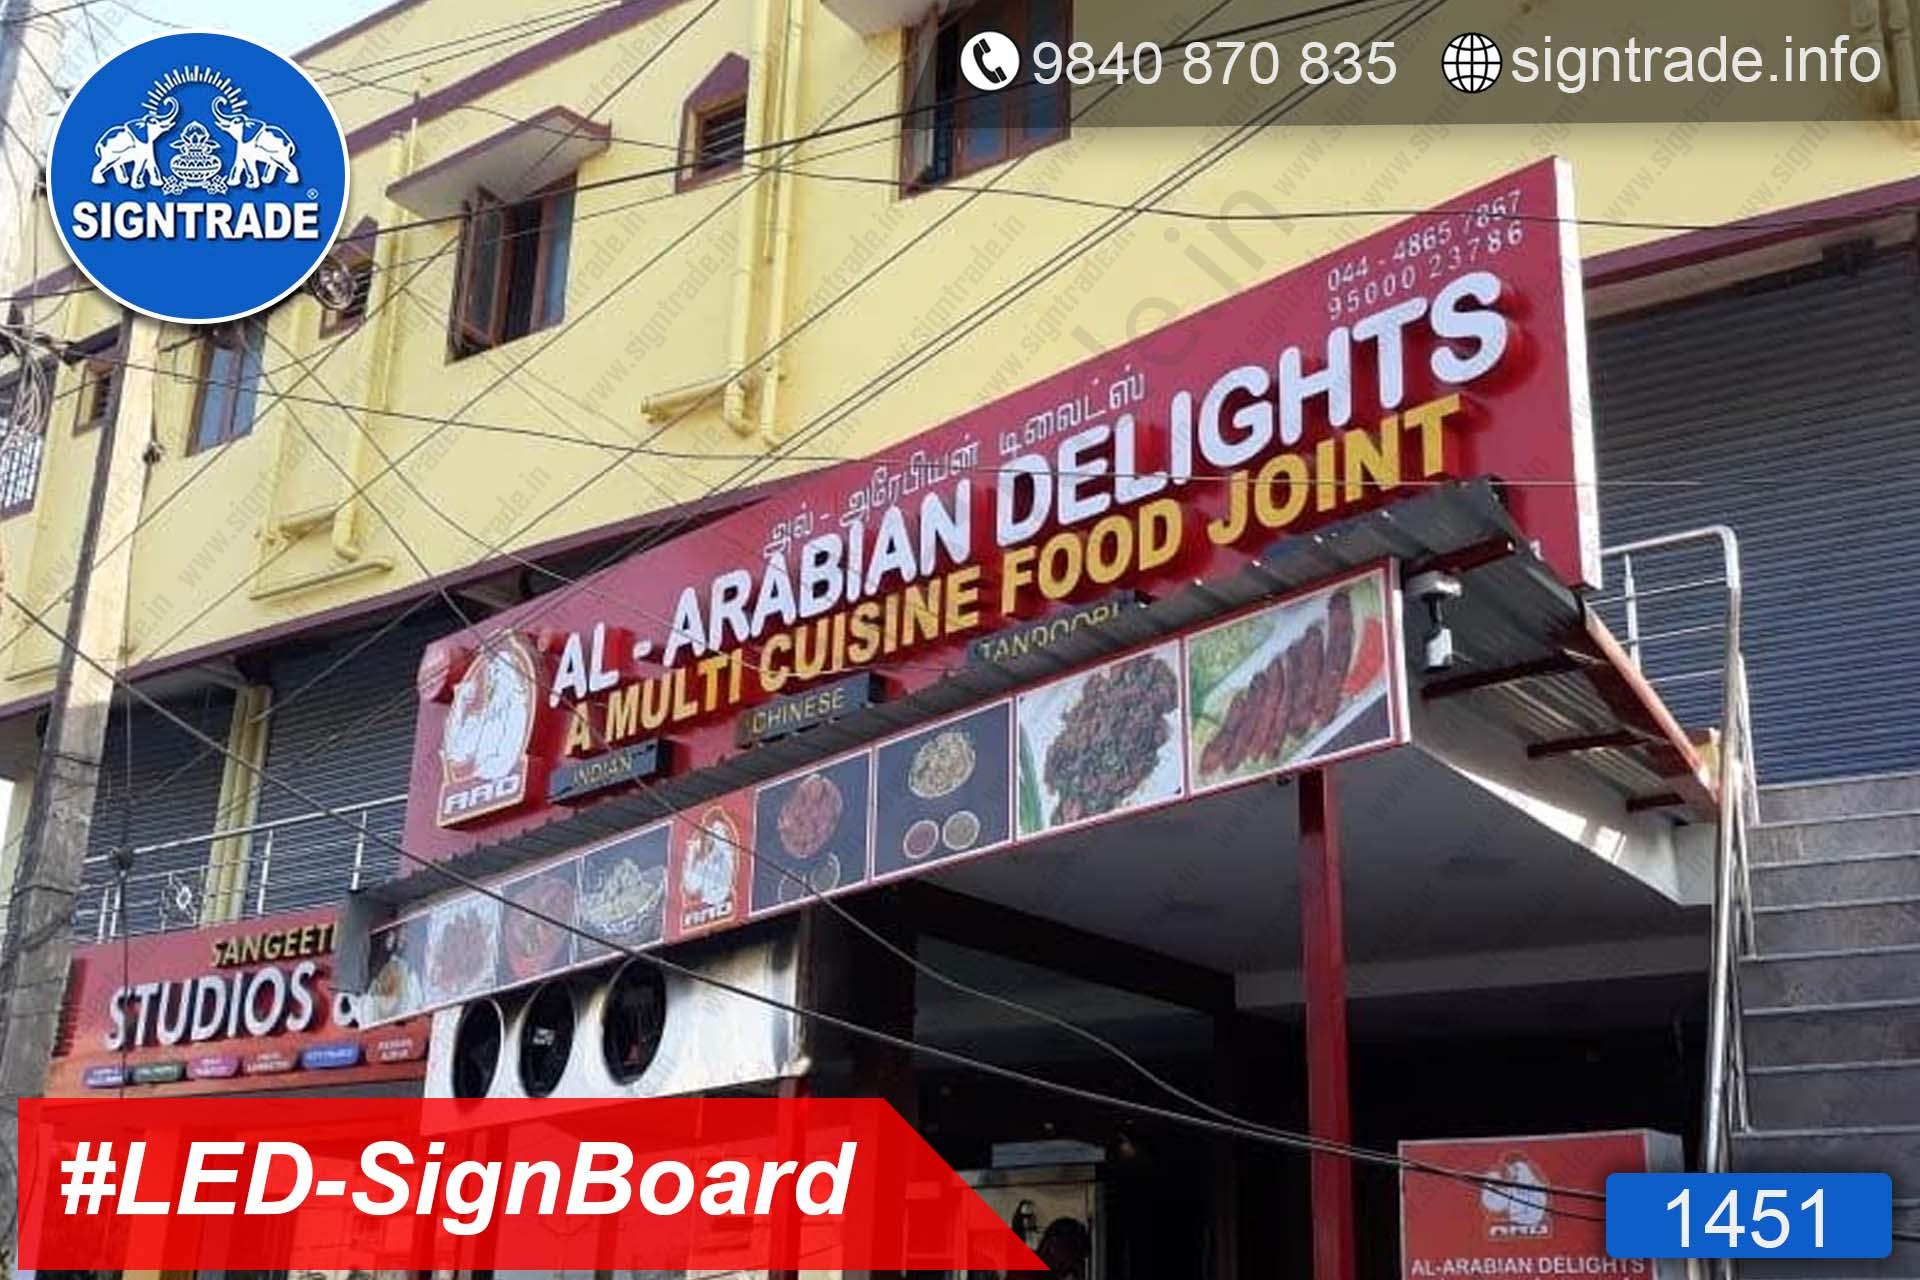 1451, LED Sign Board, Sign Board, Acrylic Sign Board, Glow Sign Board, Custom Sign Board - AL Arabian Delights - A Multi Cuisine Food Joint